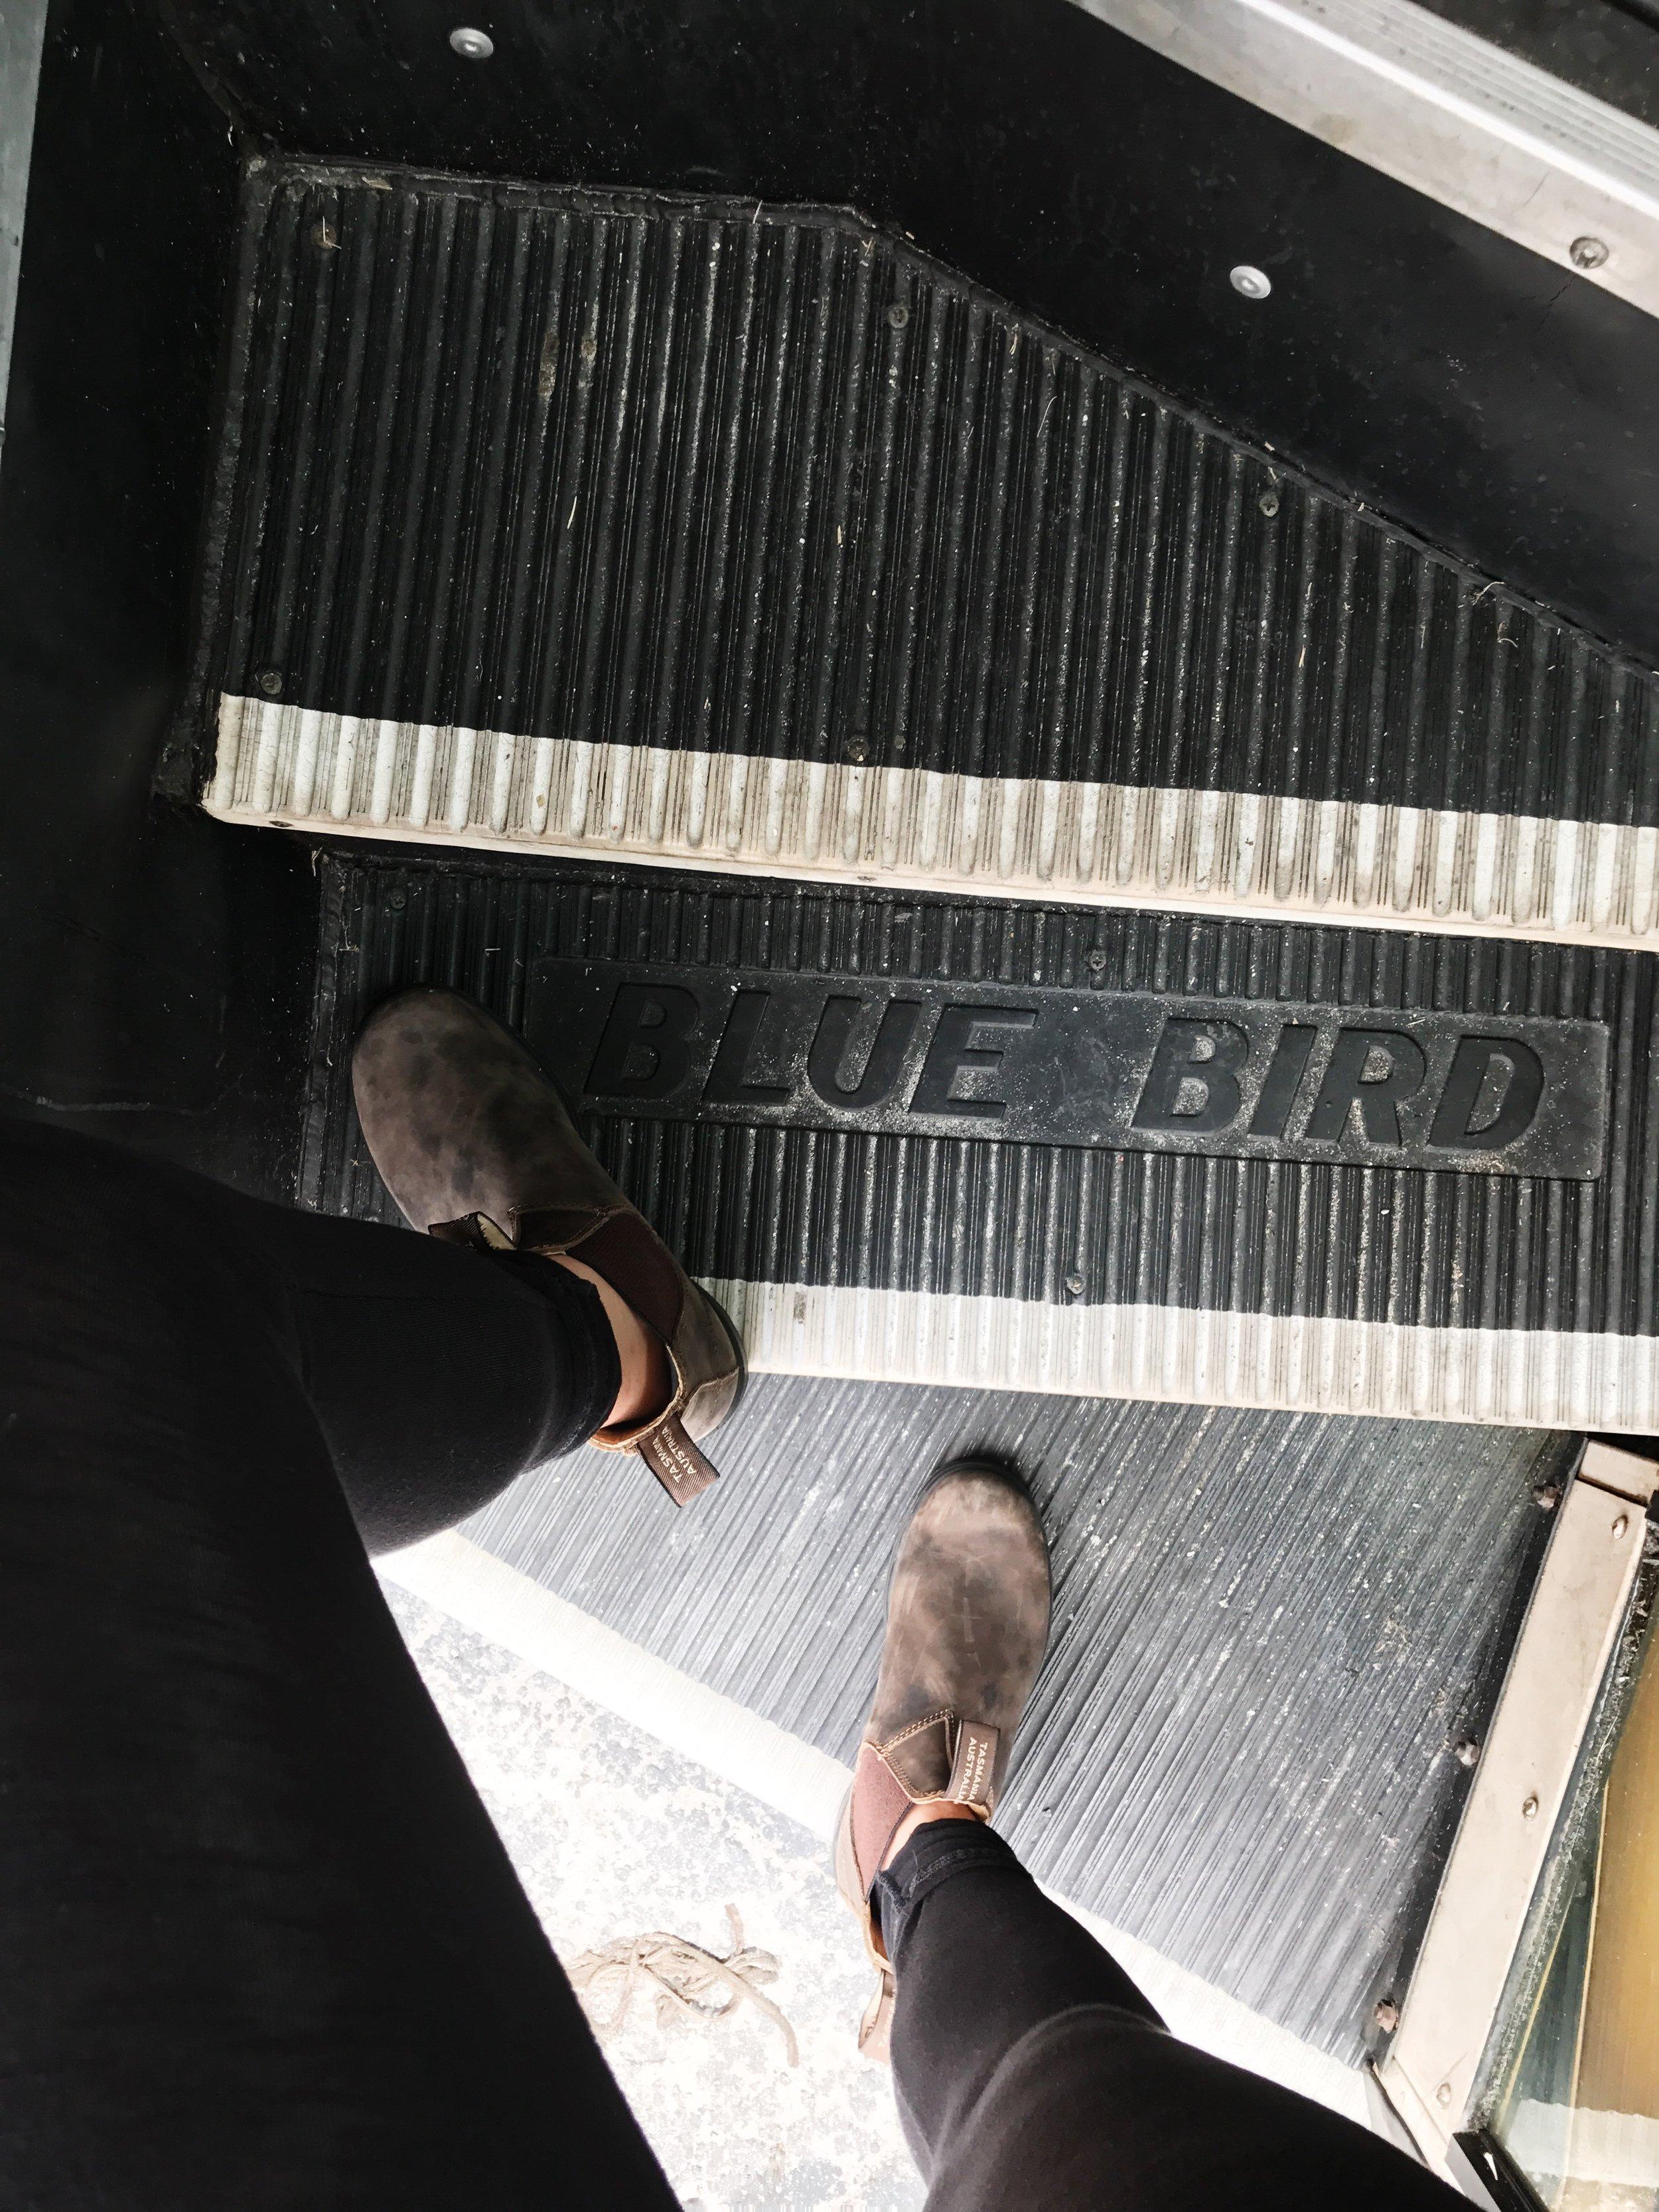 All 'Blue Bird' everything